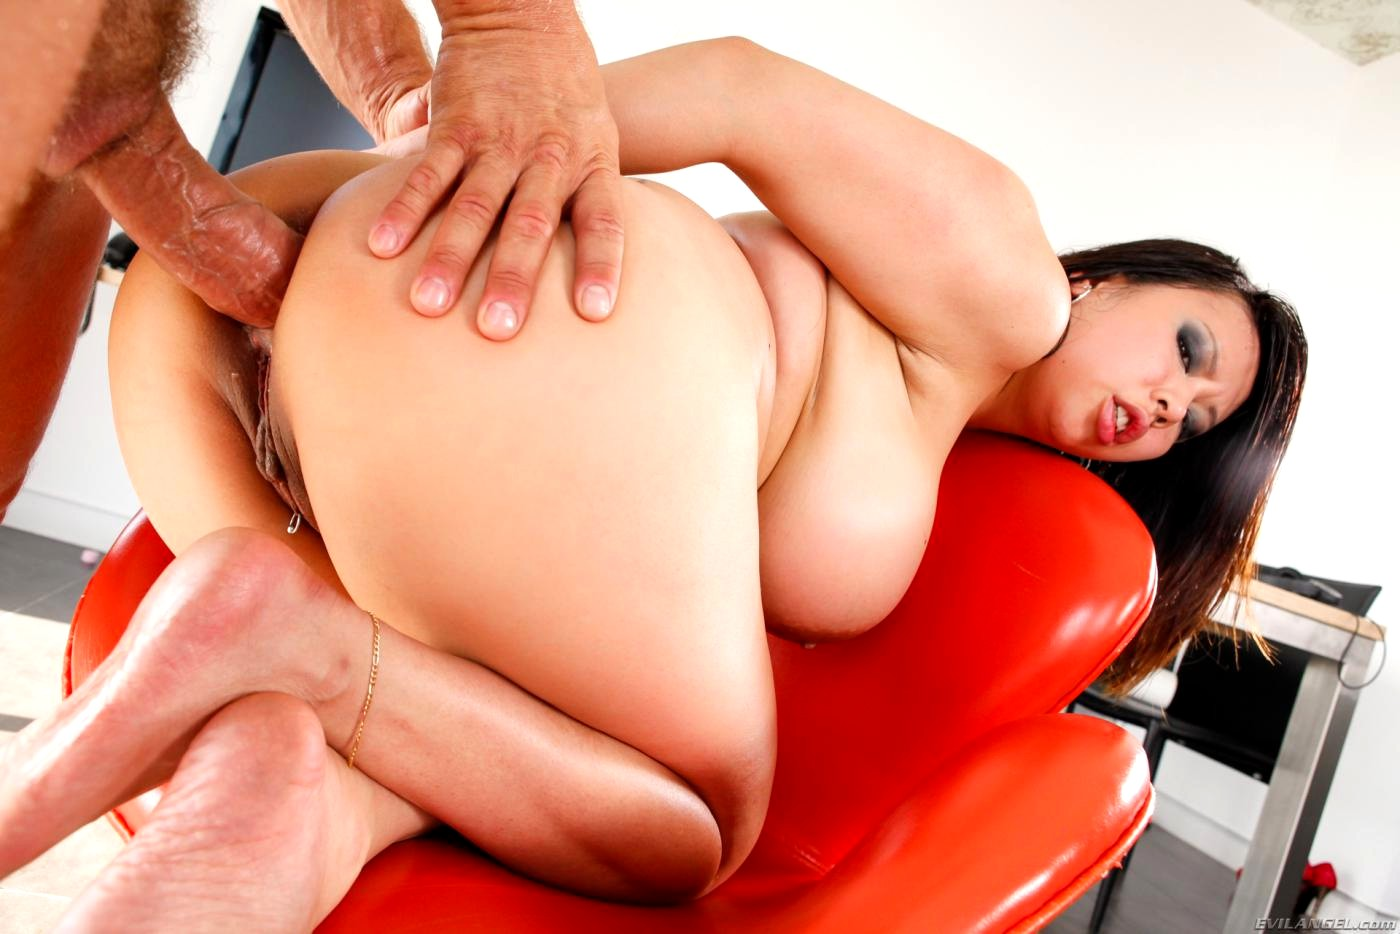 ass-busting-porn-porn-sex-nude-kadalu-in-telugu